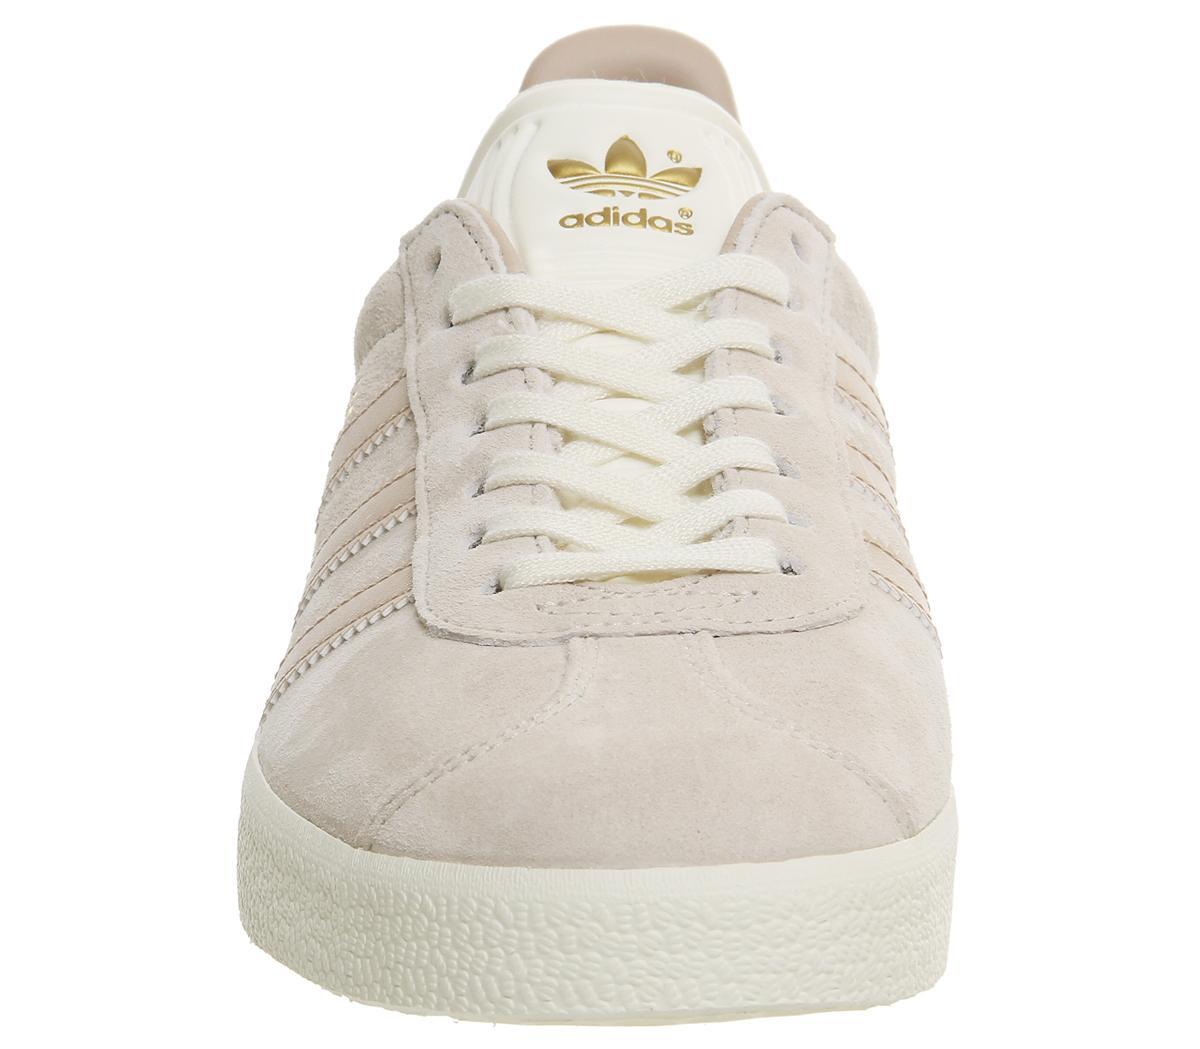 adidas Gazelle Linen Dust Pearl Cream